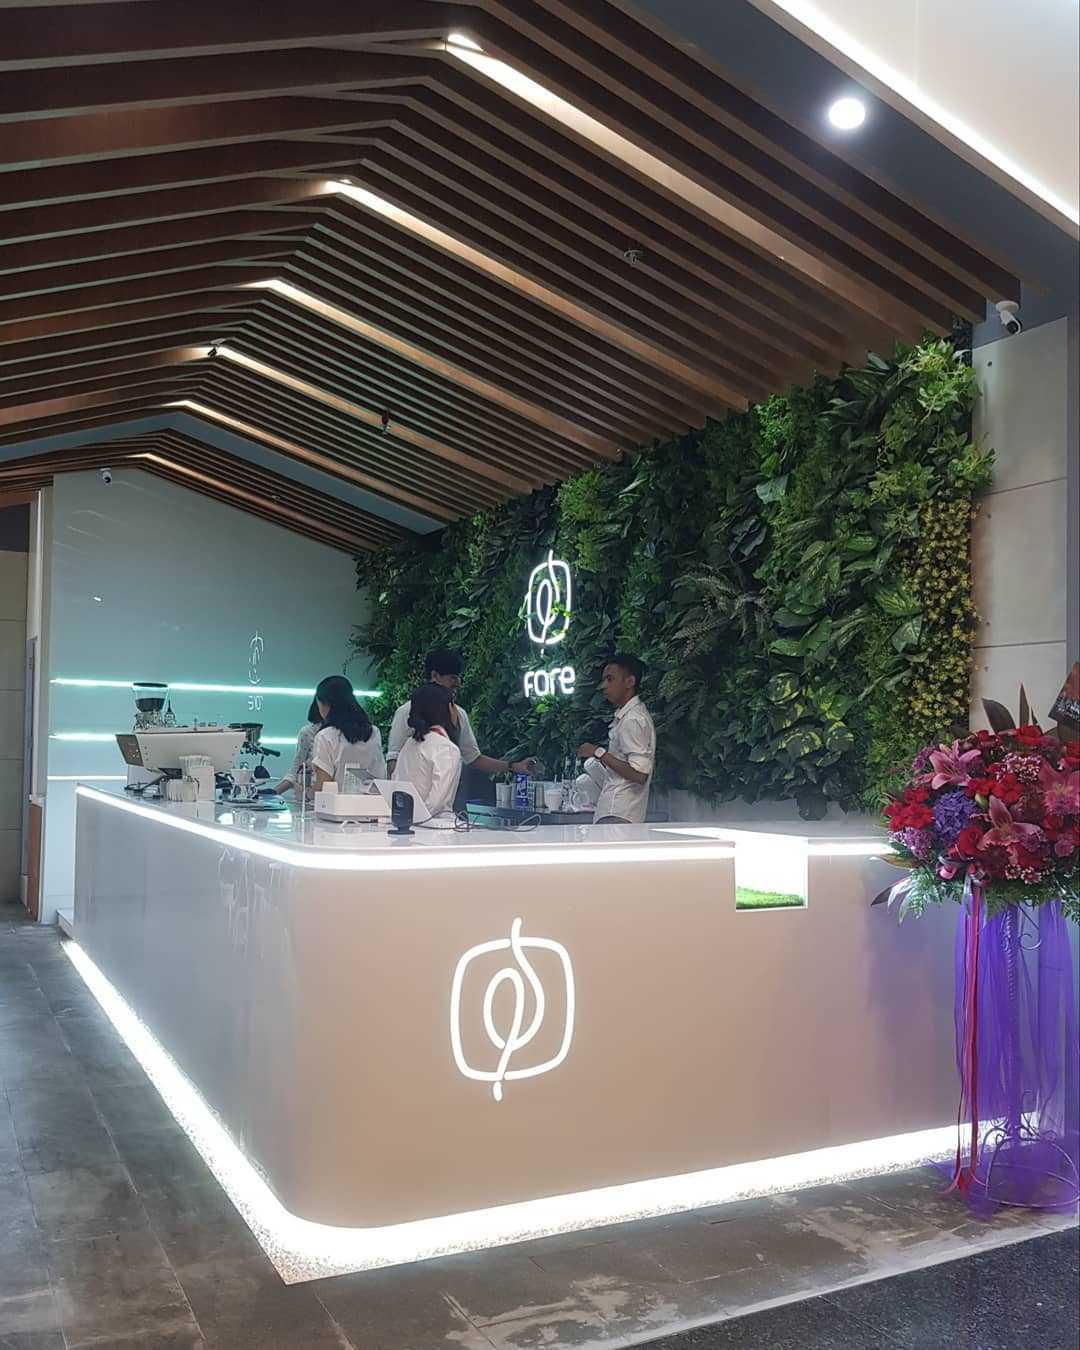 Design Vox Fore Coffee - Bej Branch Jakarta Pusat, Kota Jakarta Pusat, Daerah Khusus Ibukota Jakarta, Indonesia Jakarta Pusat, Kota Jakarta Pusat, Daerah Khusus Ibukota Jakarta, Indonesia Design-Vox-Fore-Coffee-Bej-Branch   94682